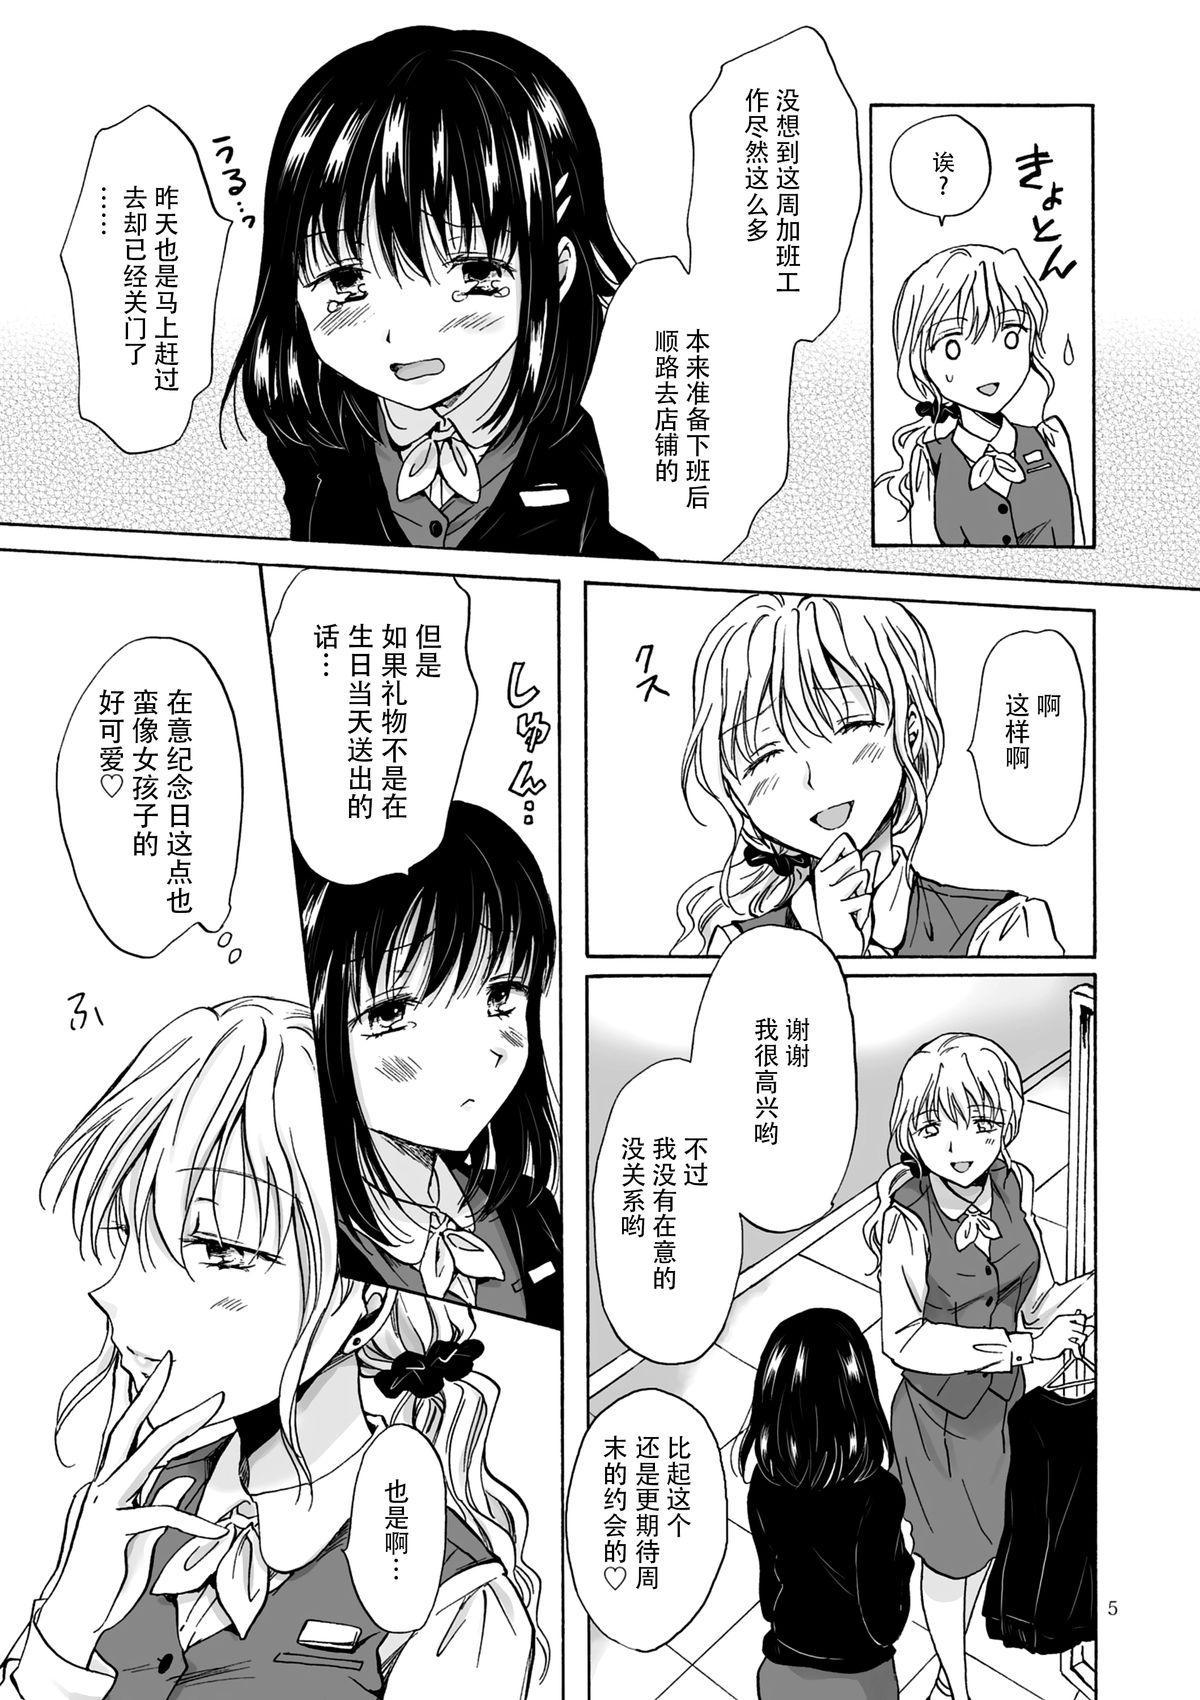 OL-san ga Oppai dake de Icchau Manga 5